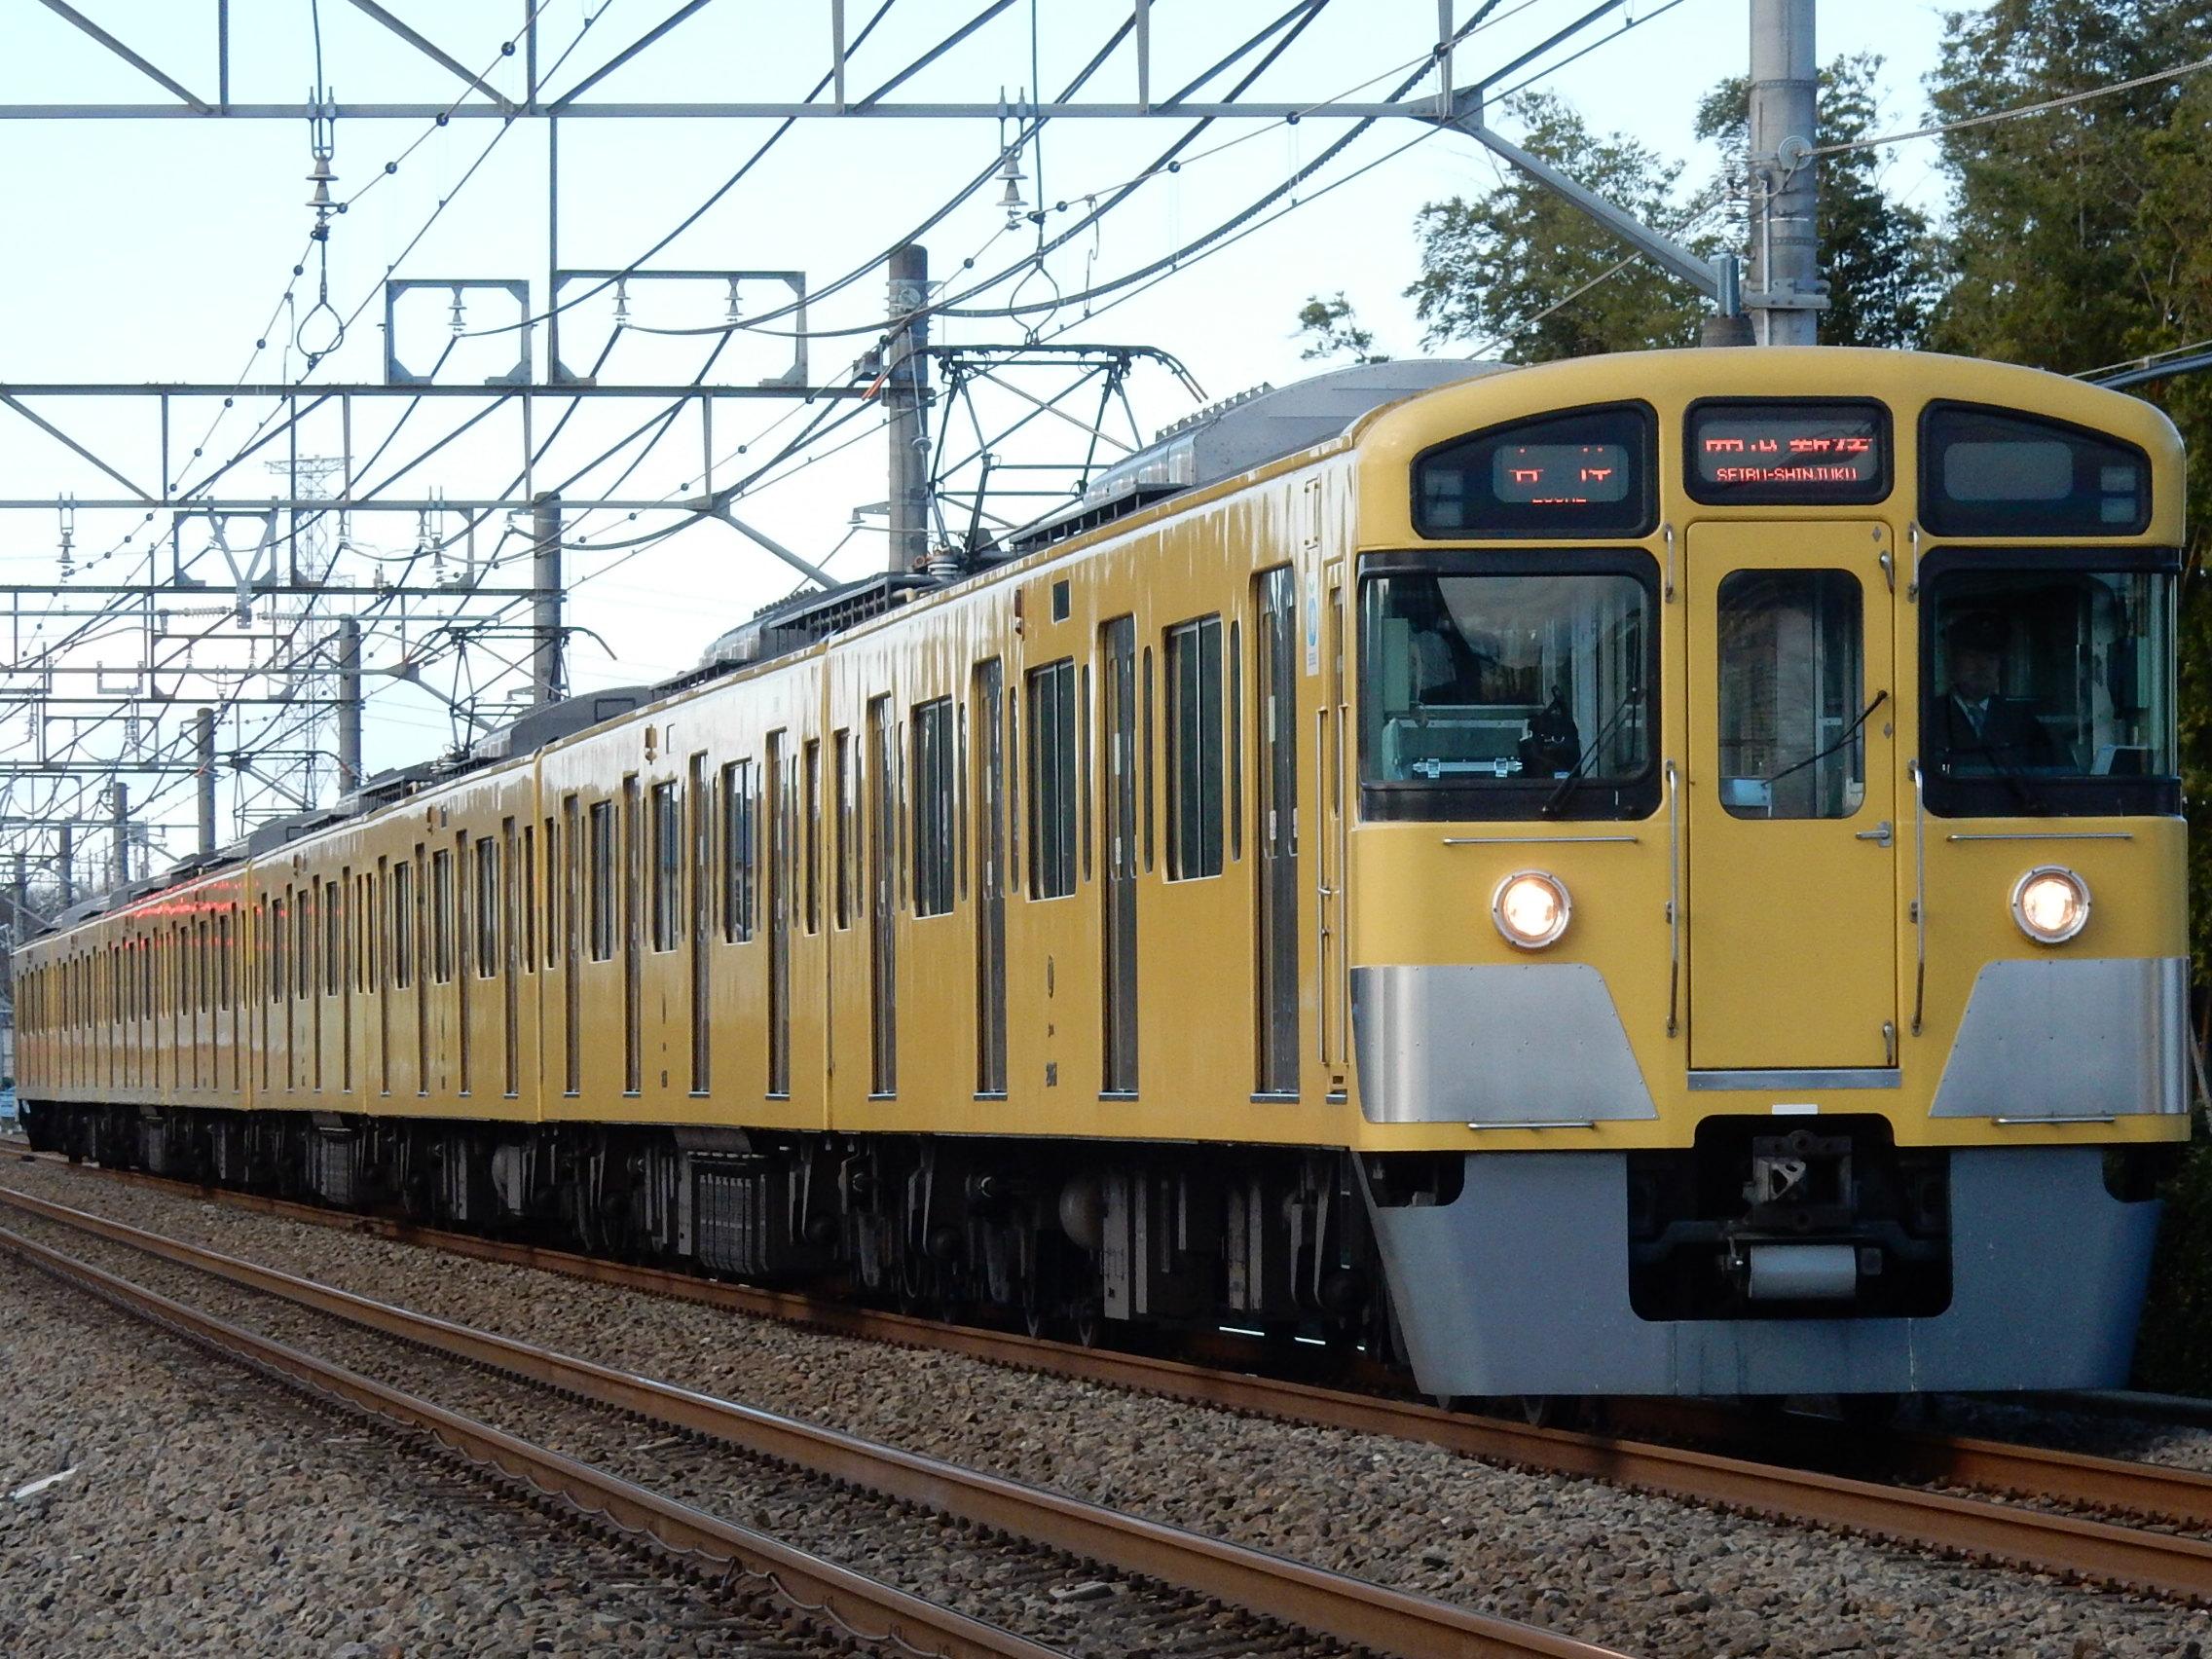 RSCN9401.jpg